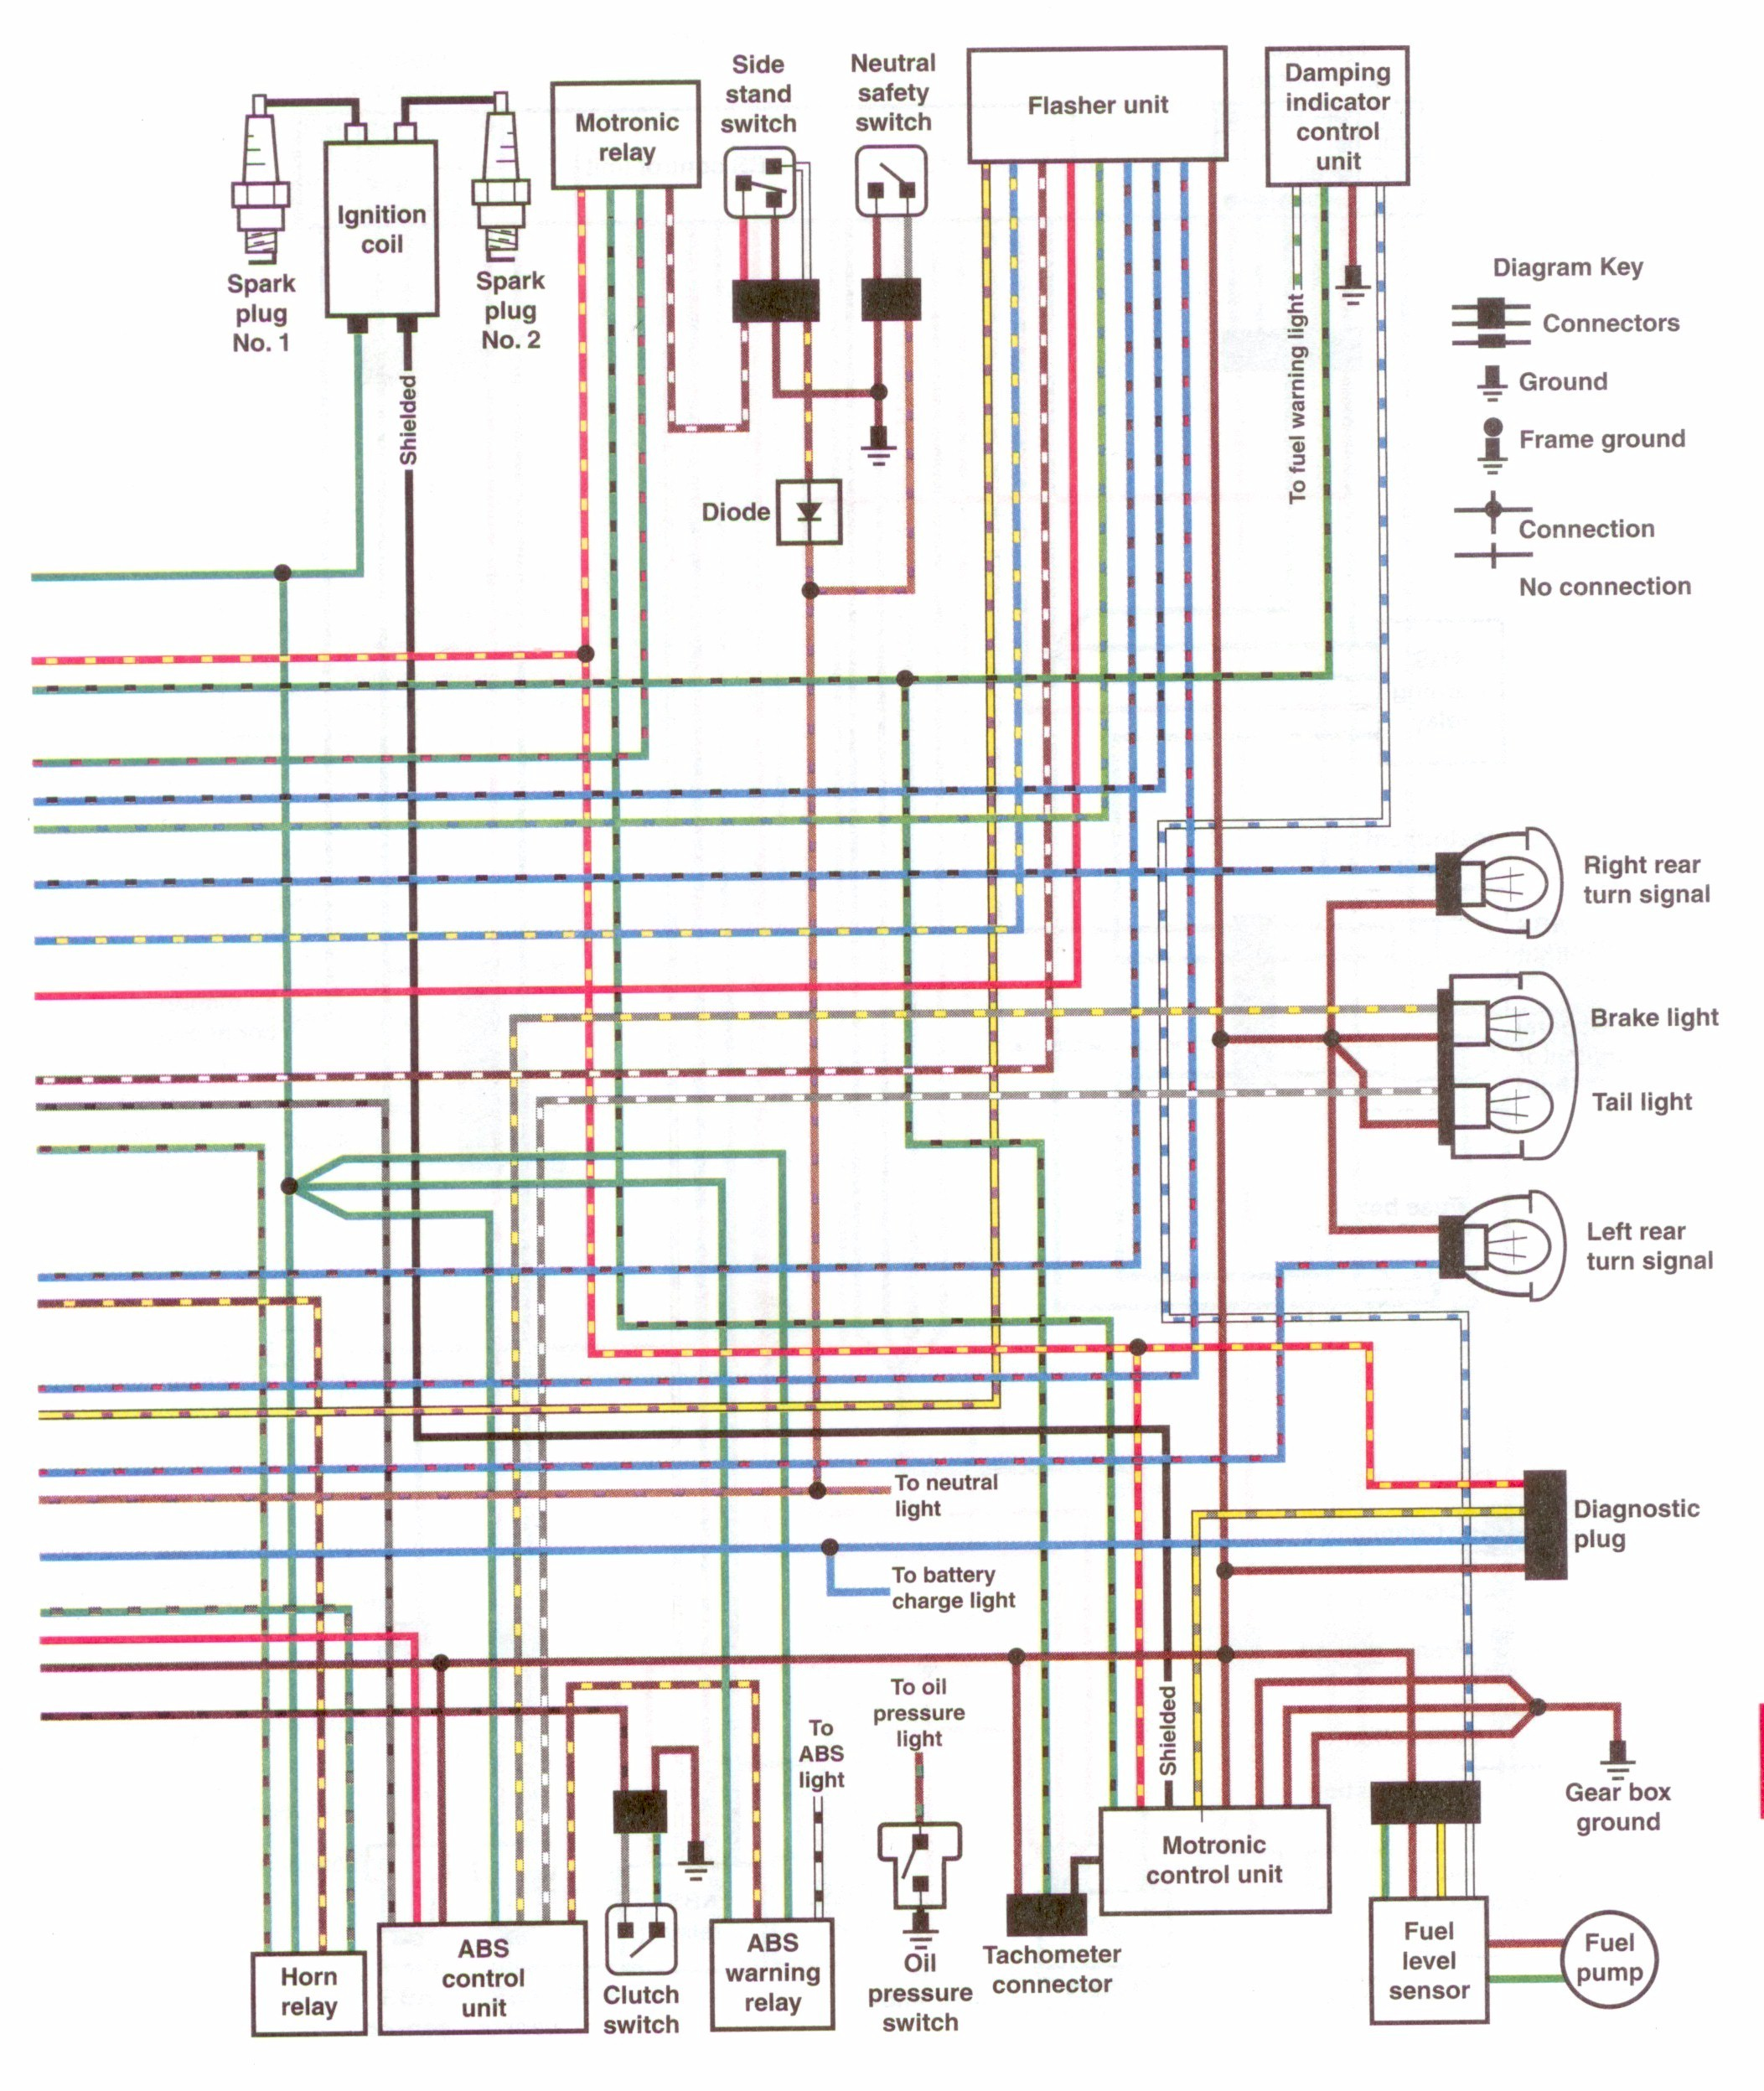 DZ_2233] E46 Dme Wiring Diagram Wiring Diagram | Bmw E46 Wiring Diagrams |  | Www Mohammedshrine Librar Wiring 101